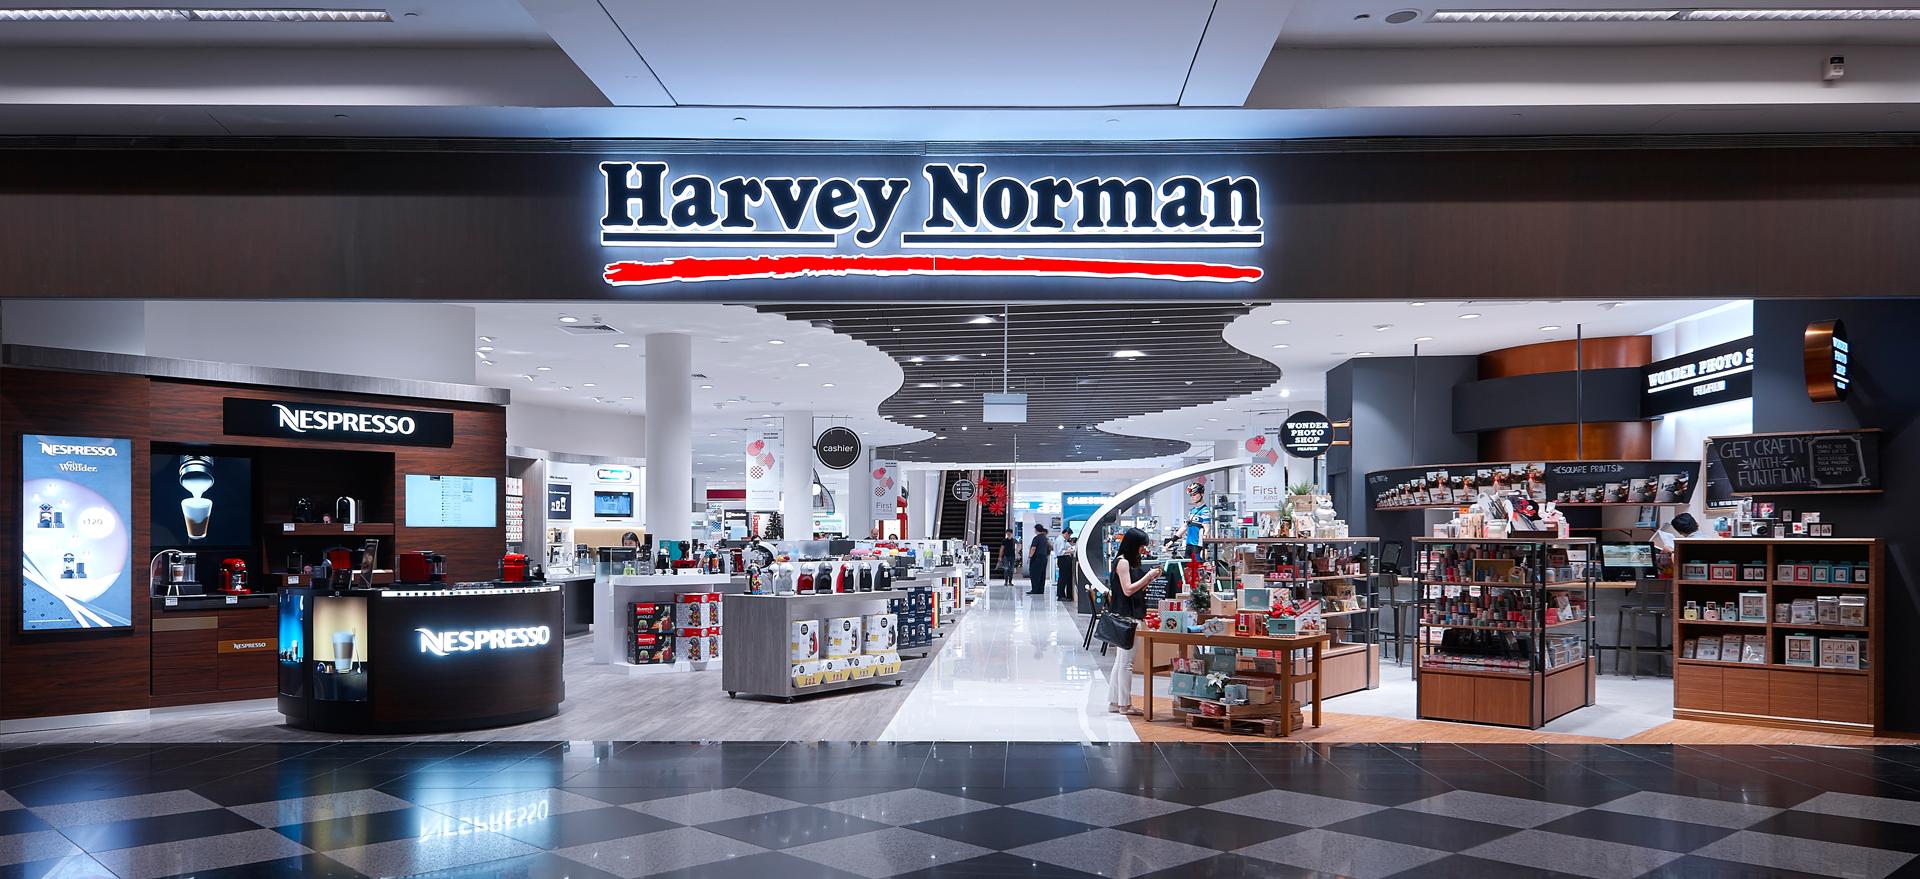 Printers & Scanners - Harvey Norman Australia Photo scanner harvey norman